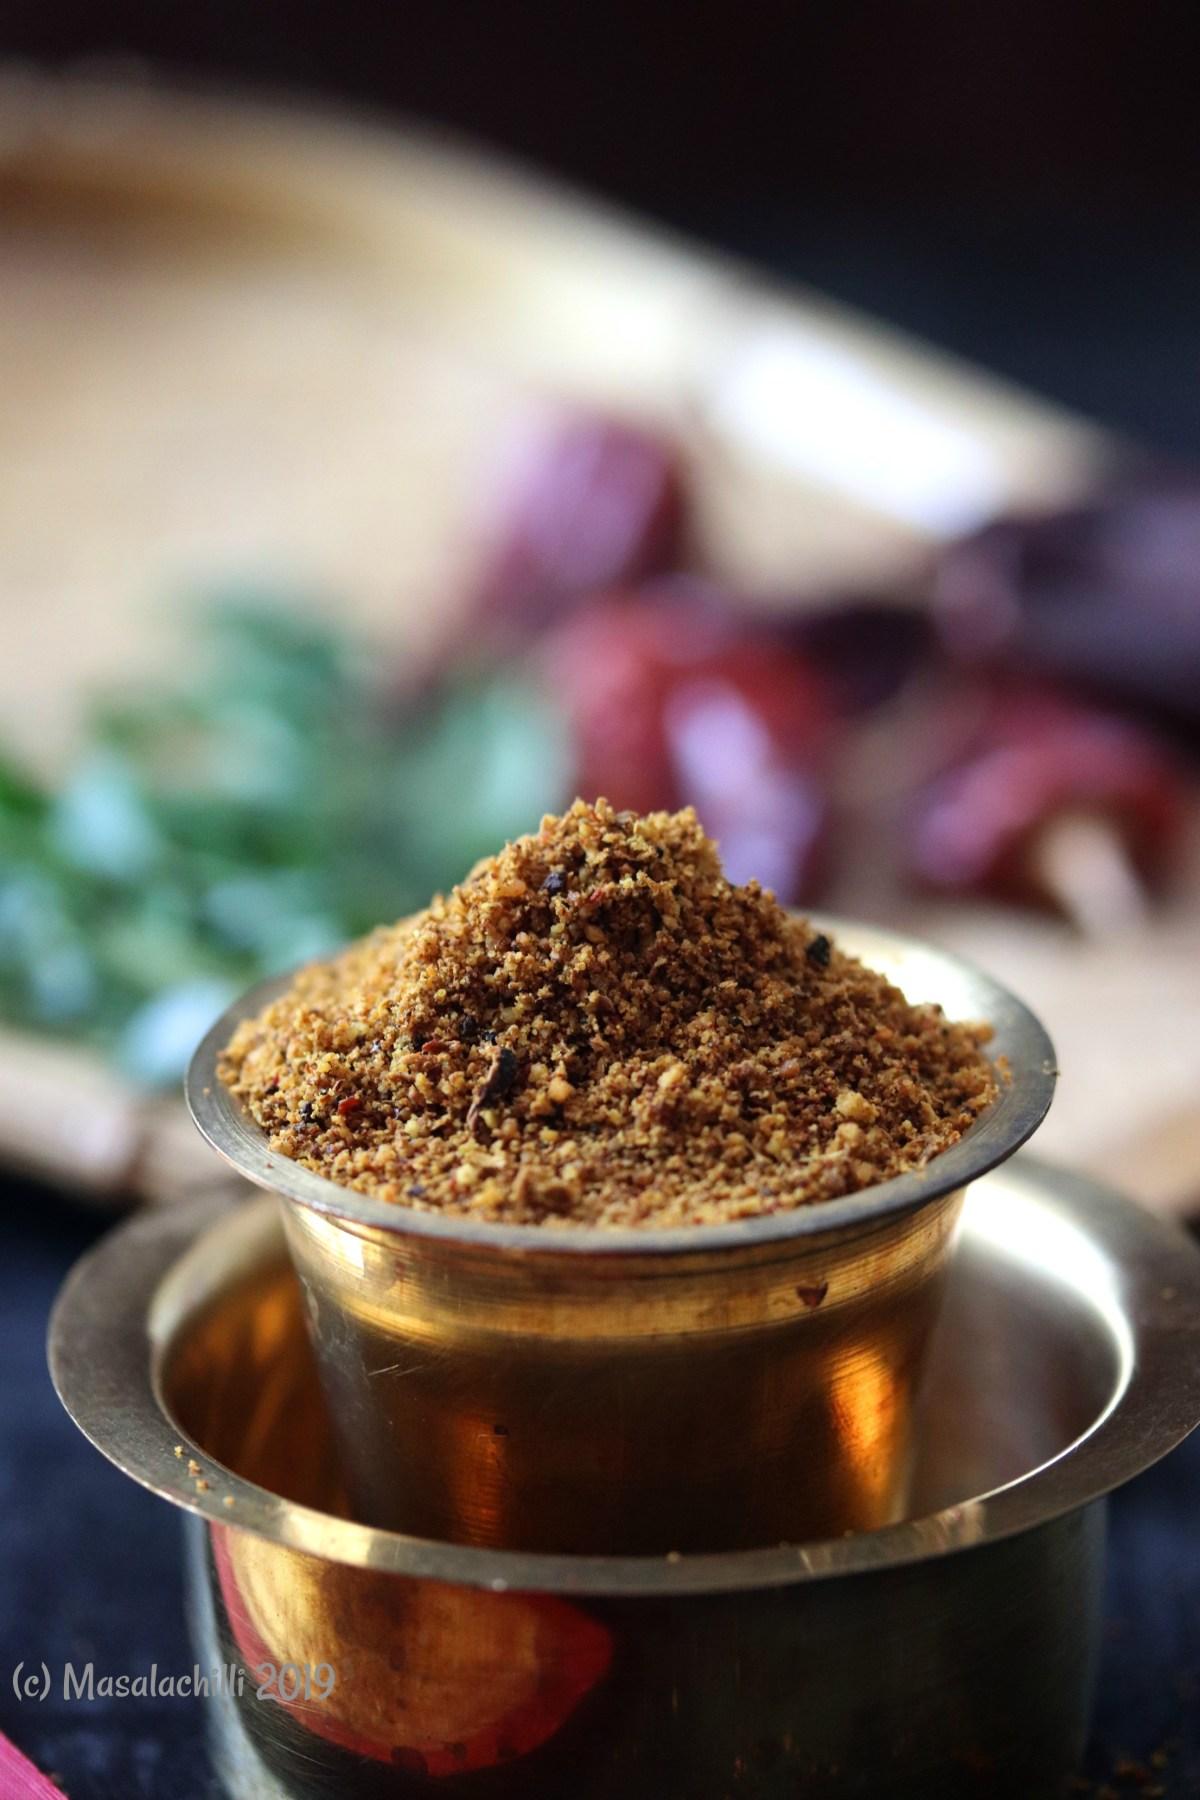 Udipi cuisine homemade Bisi Bele Bath powder or Bisi Bele bath masala recipe